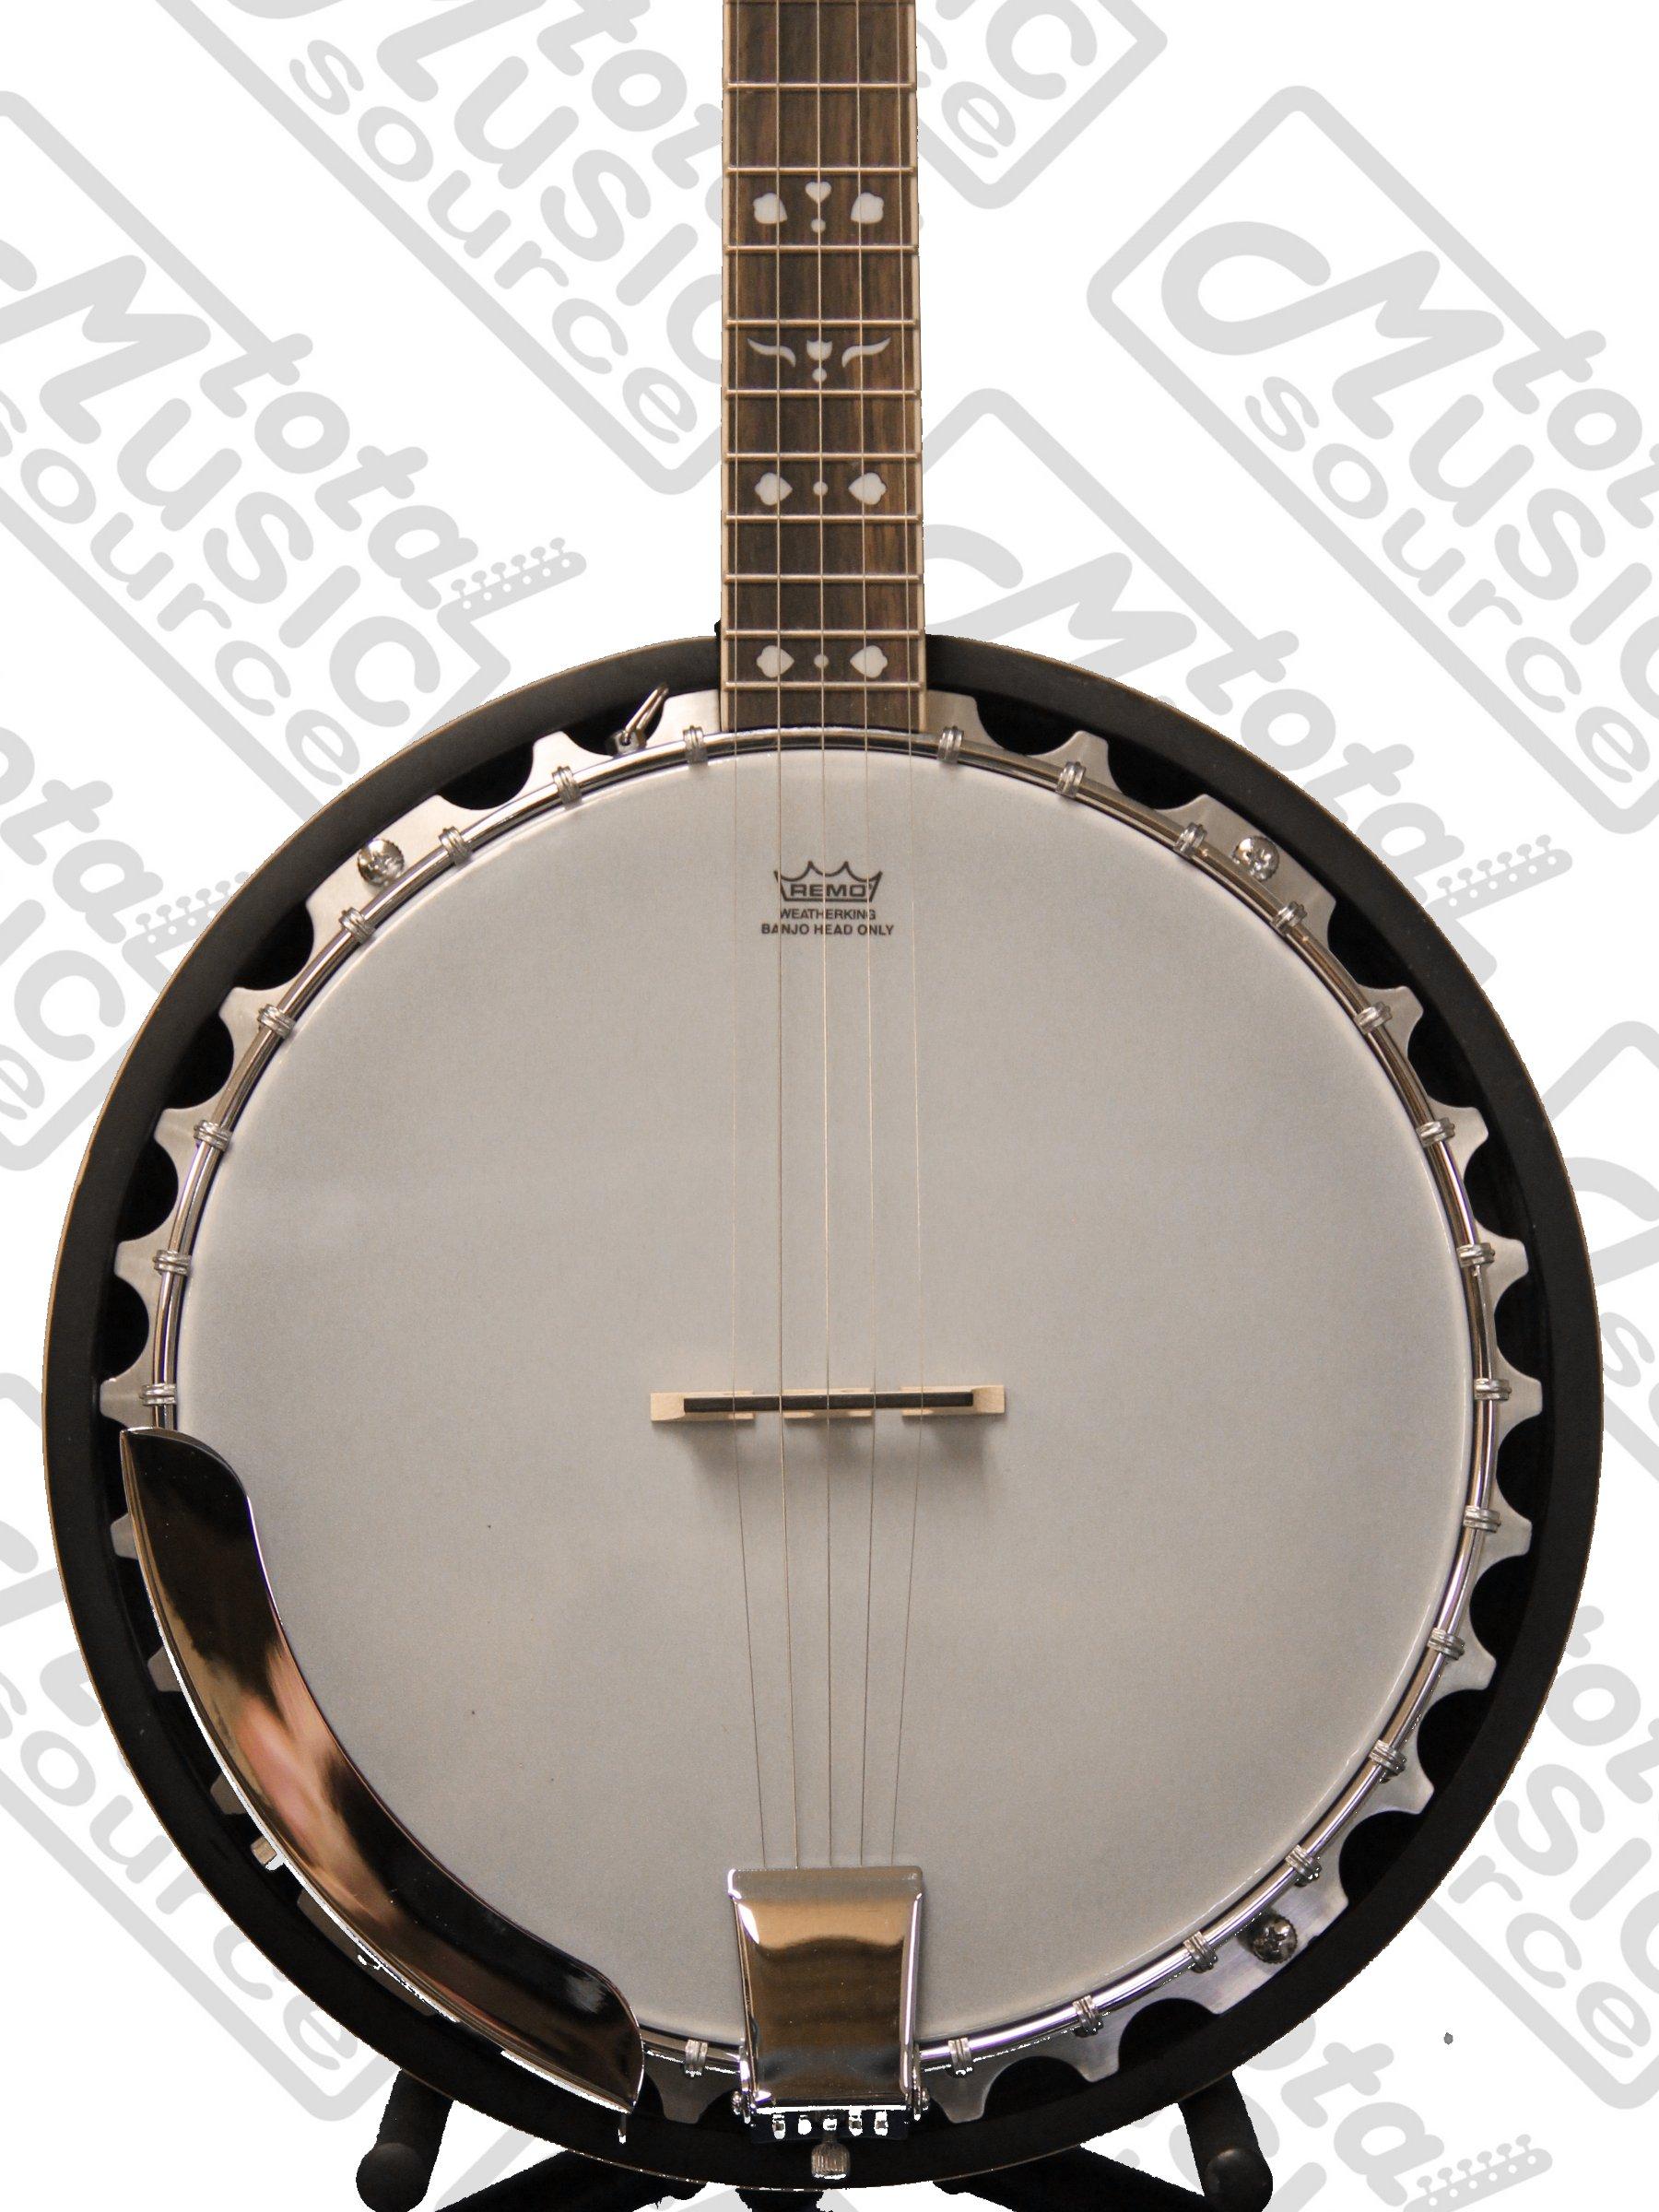 Oscar Schmidt OB5SP 5-String Banjo, Remo Head,Spalted Maple Resonator, Gloss Finish by Oscar Schmidt (Image #2)